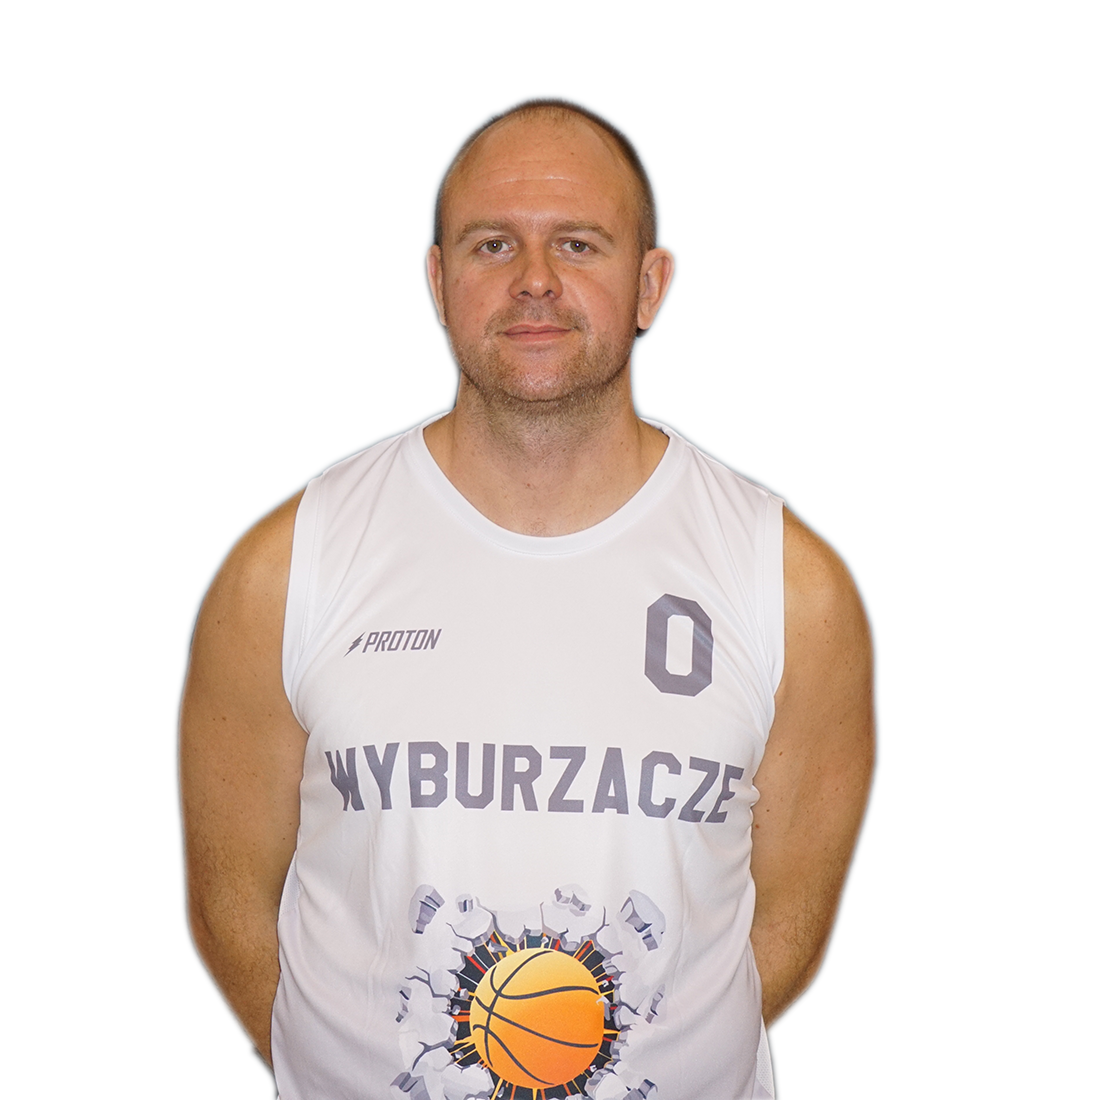 Dariusz Waligóra